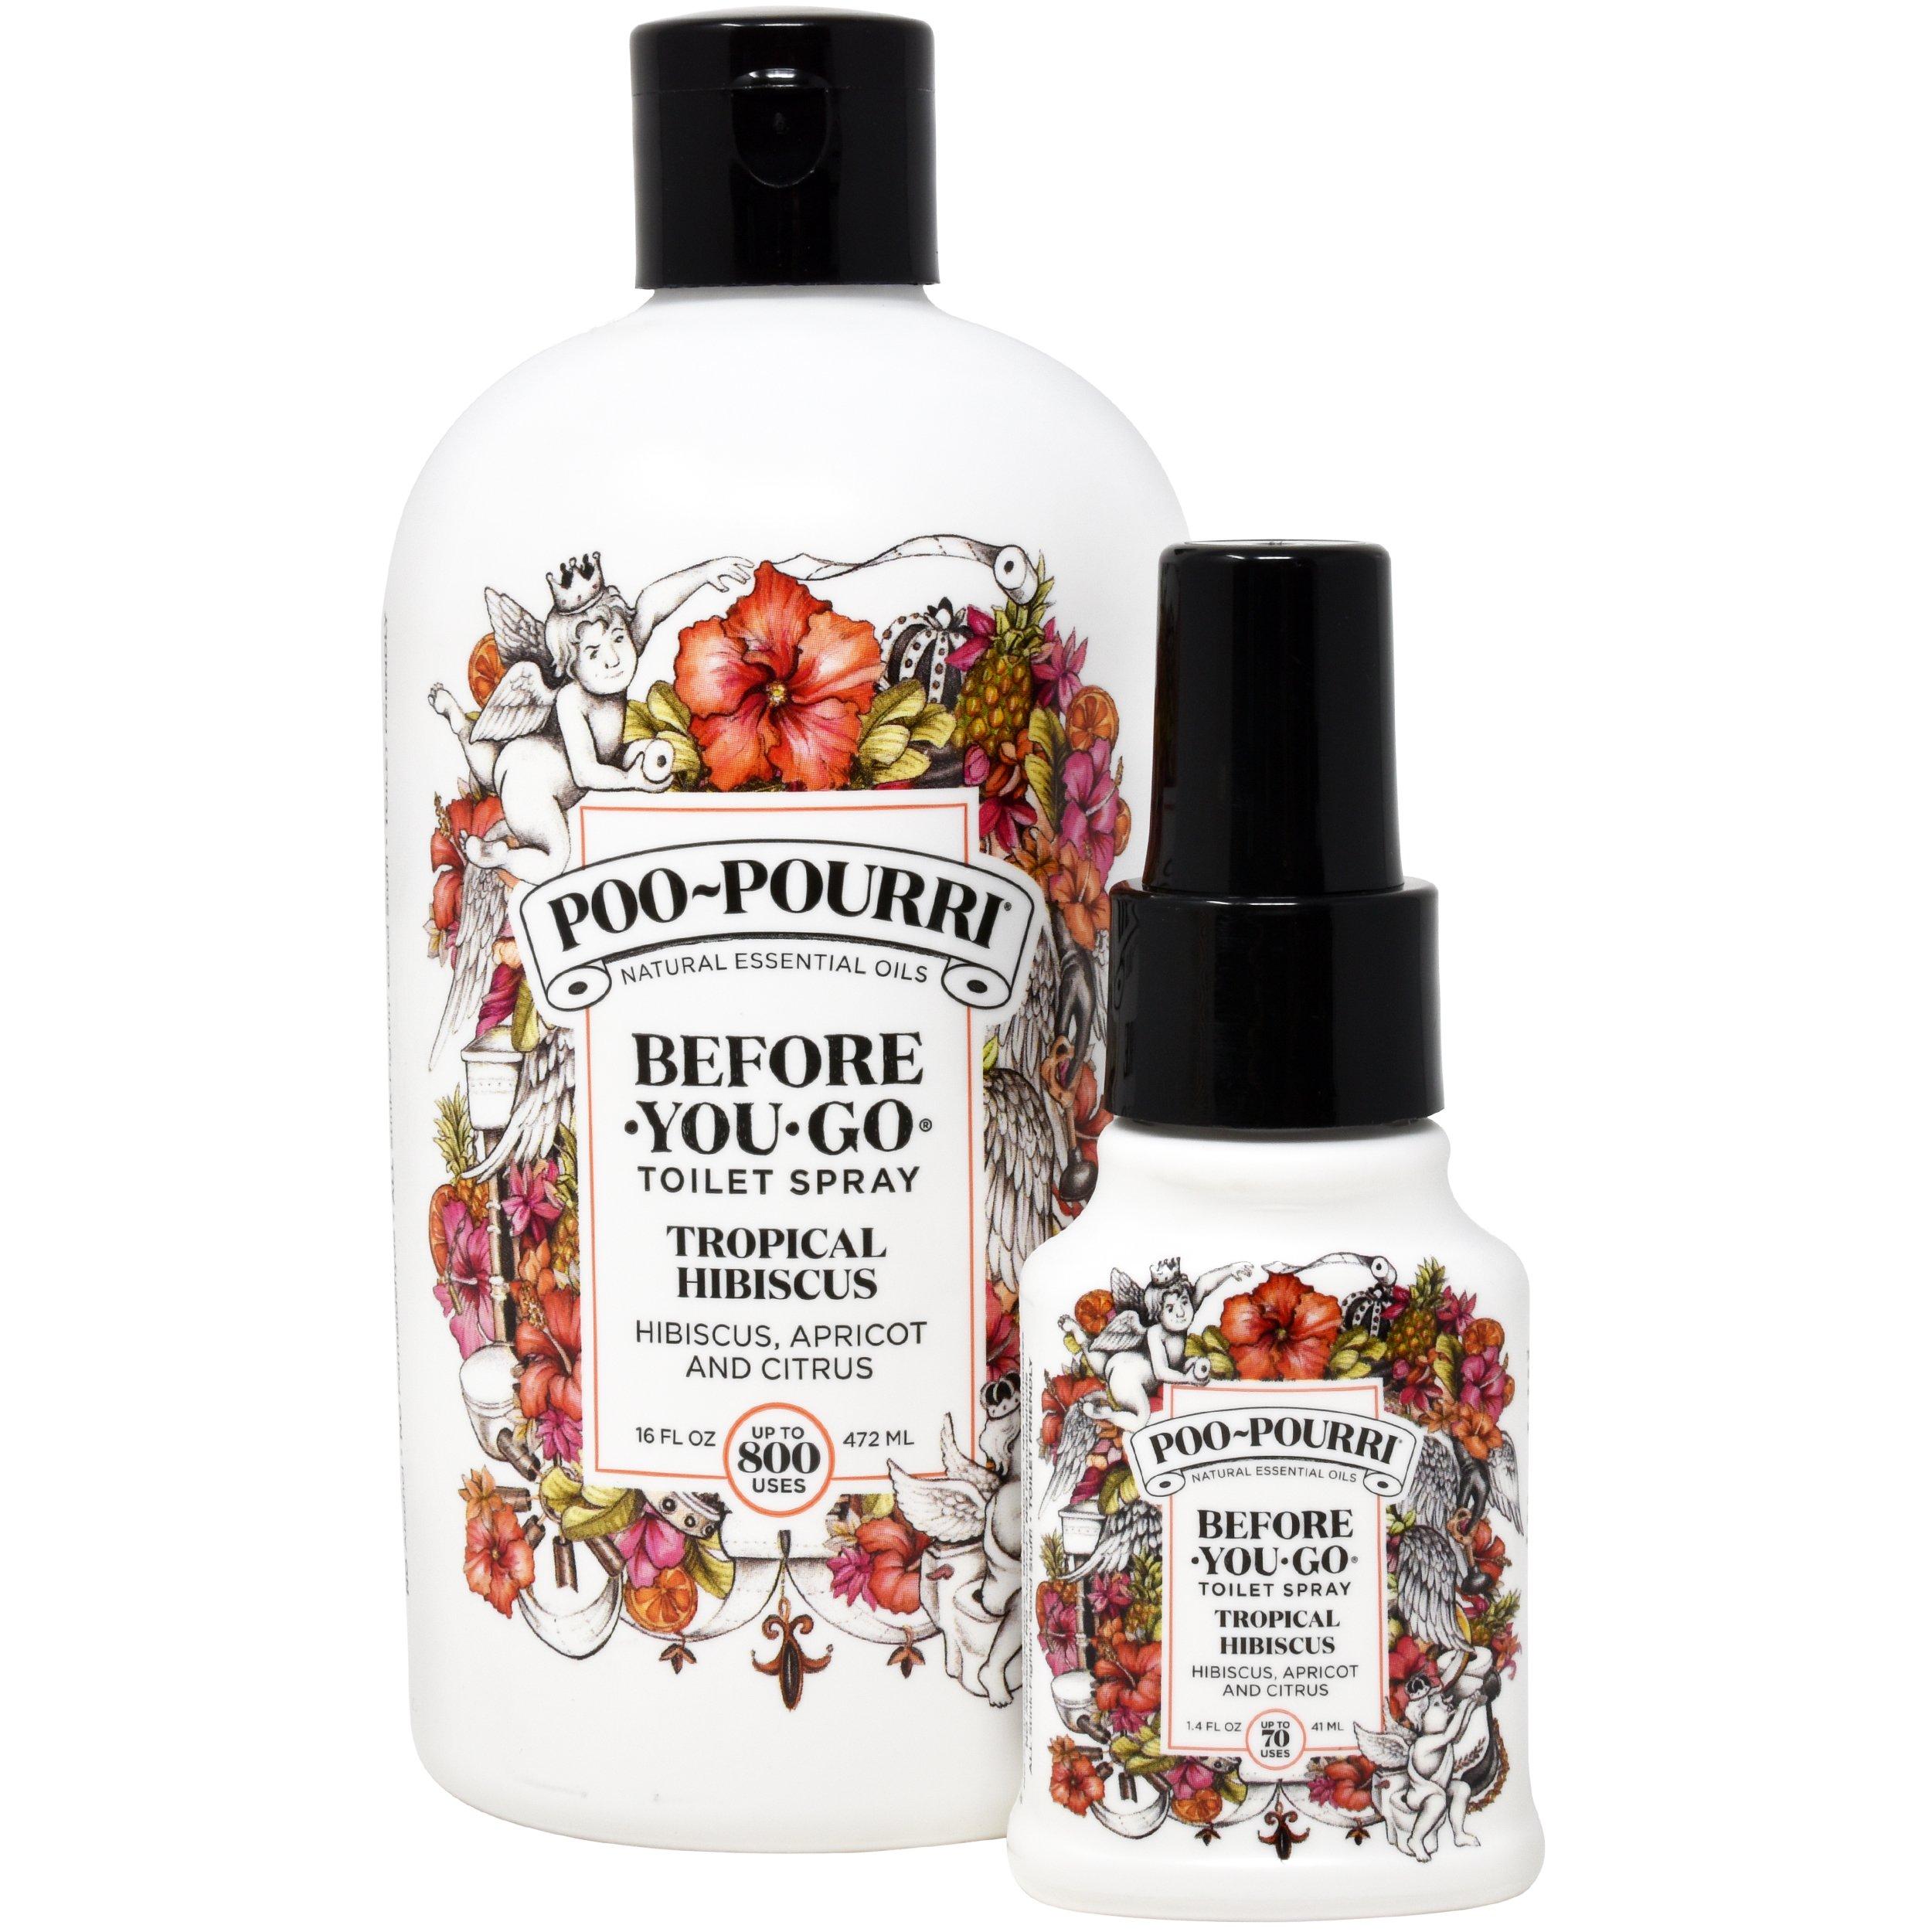 Poo-Pourri Tropical Hibiscus 16-Ounce Refill Bottle and 1.4-Ounce Tropical Hibiscus by Poo-Pourri